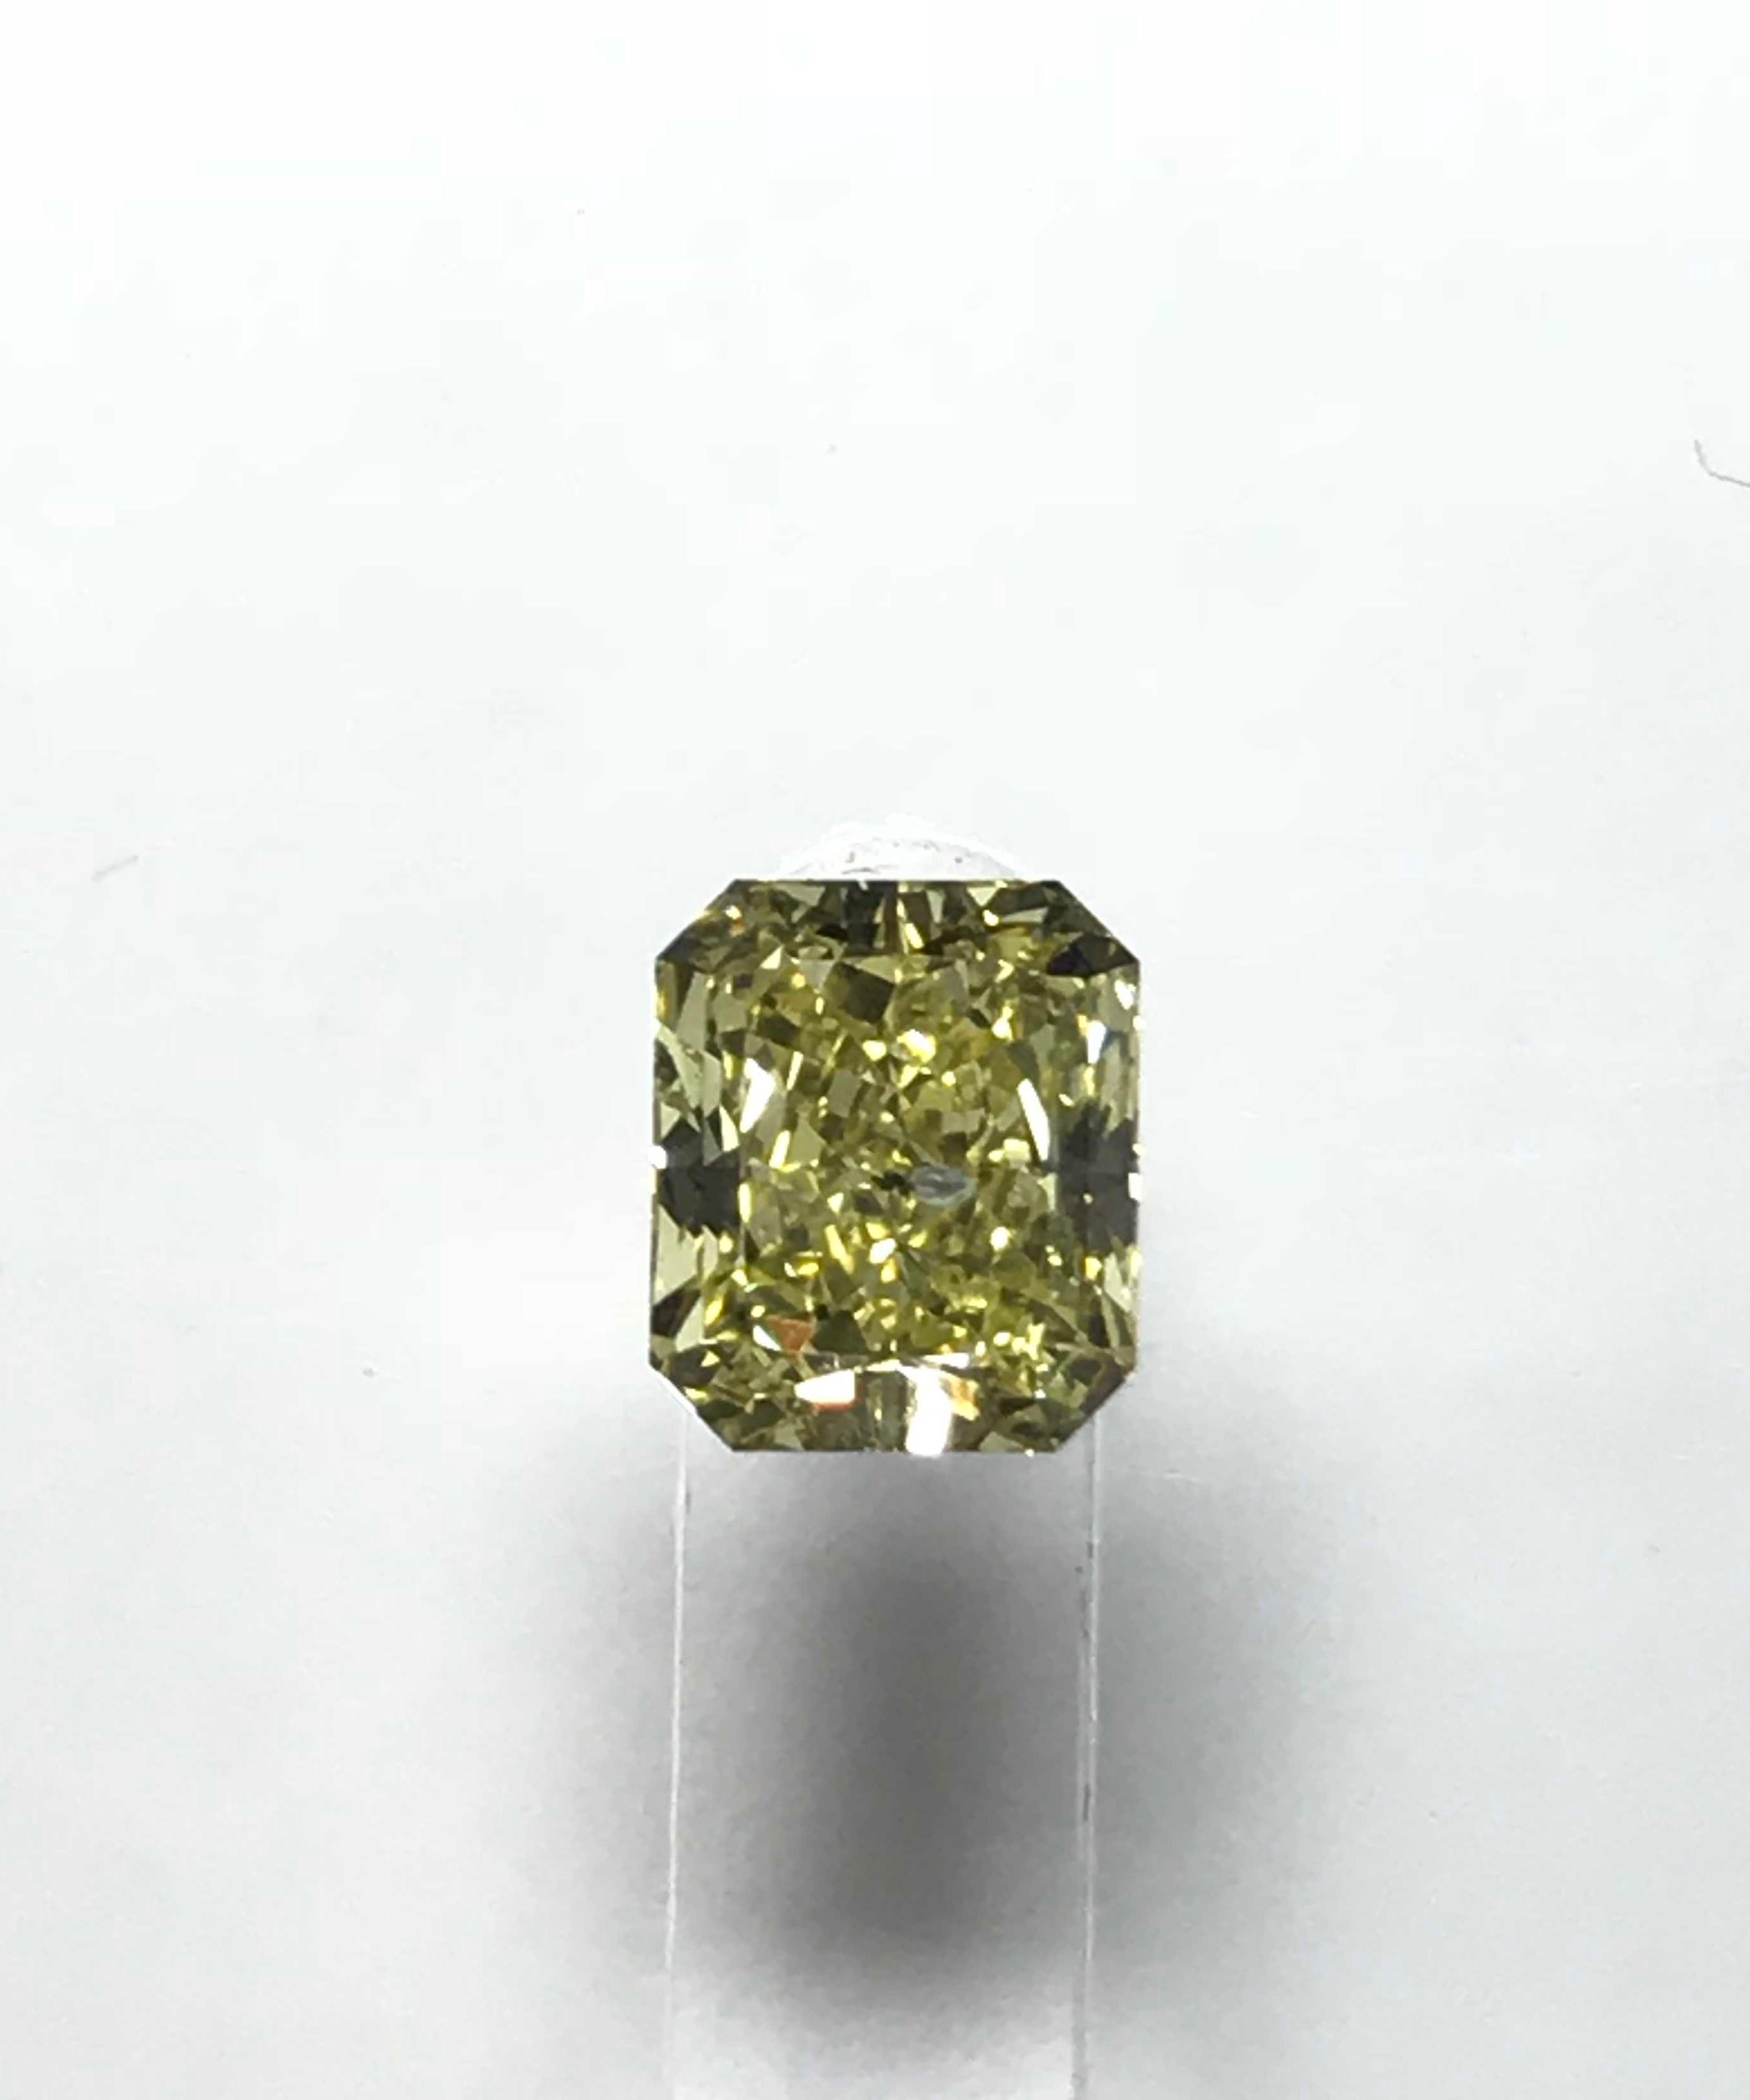 Stephen's Fine Jewelry, Inc - Diamond Image - D01215